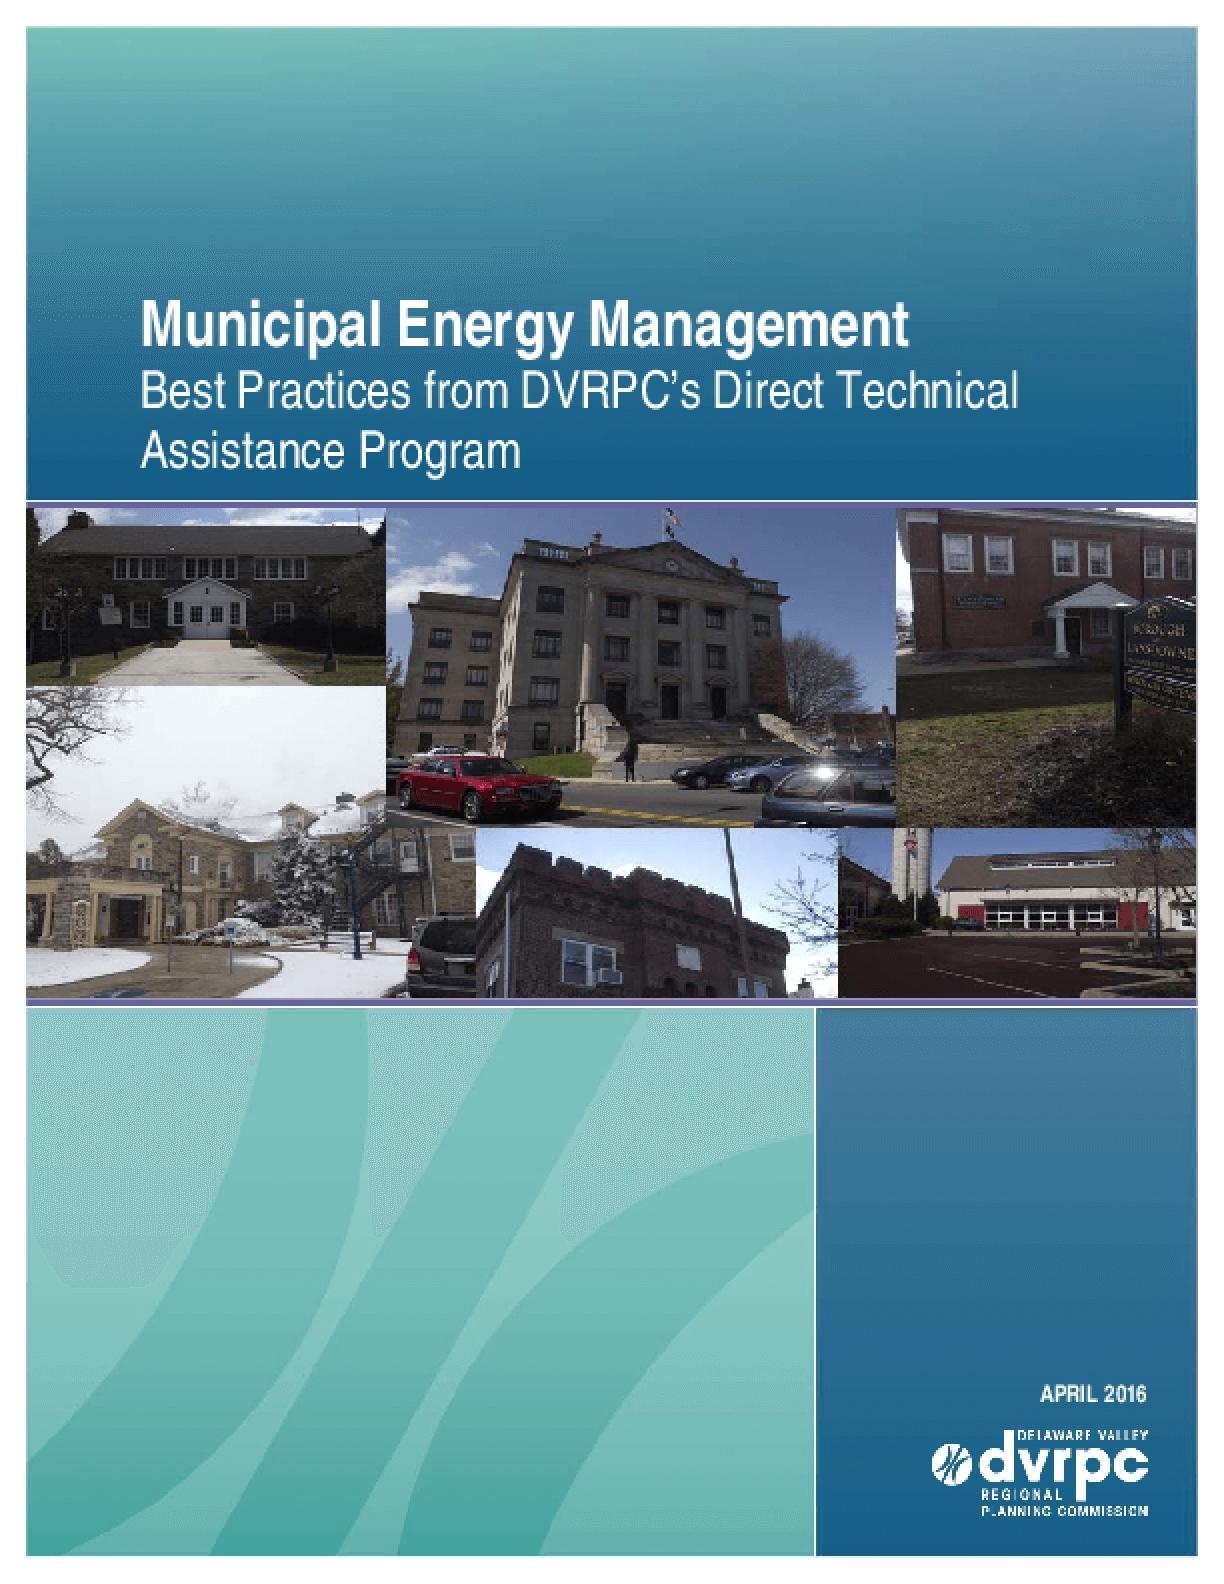 Municipal Energy Management: Best Practices from DVRPC's Direct Technical Assistance Program